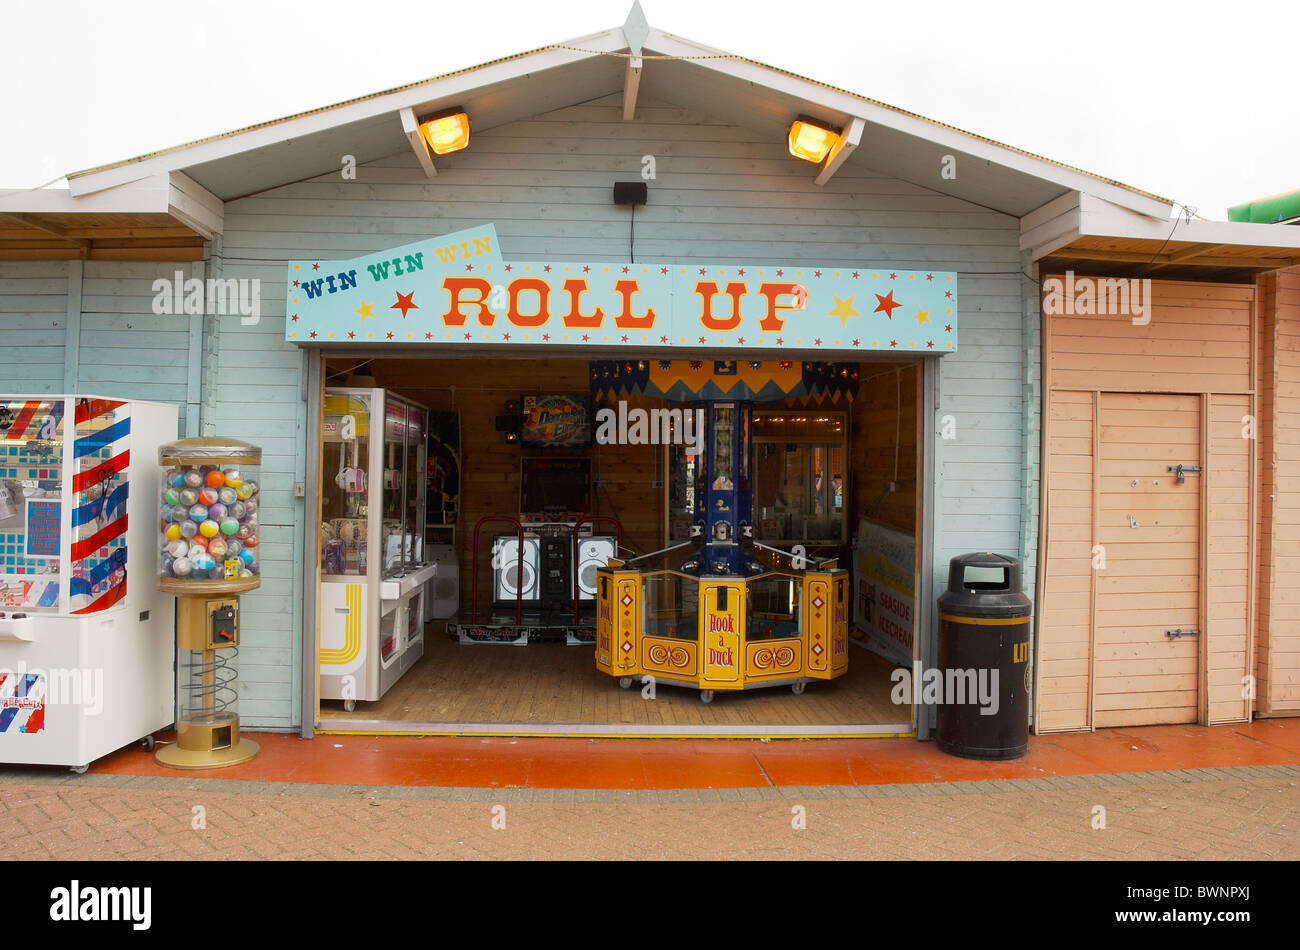 Amusement Arcade at Clacton on Sea - Stock Image